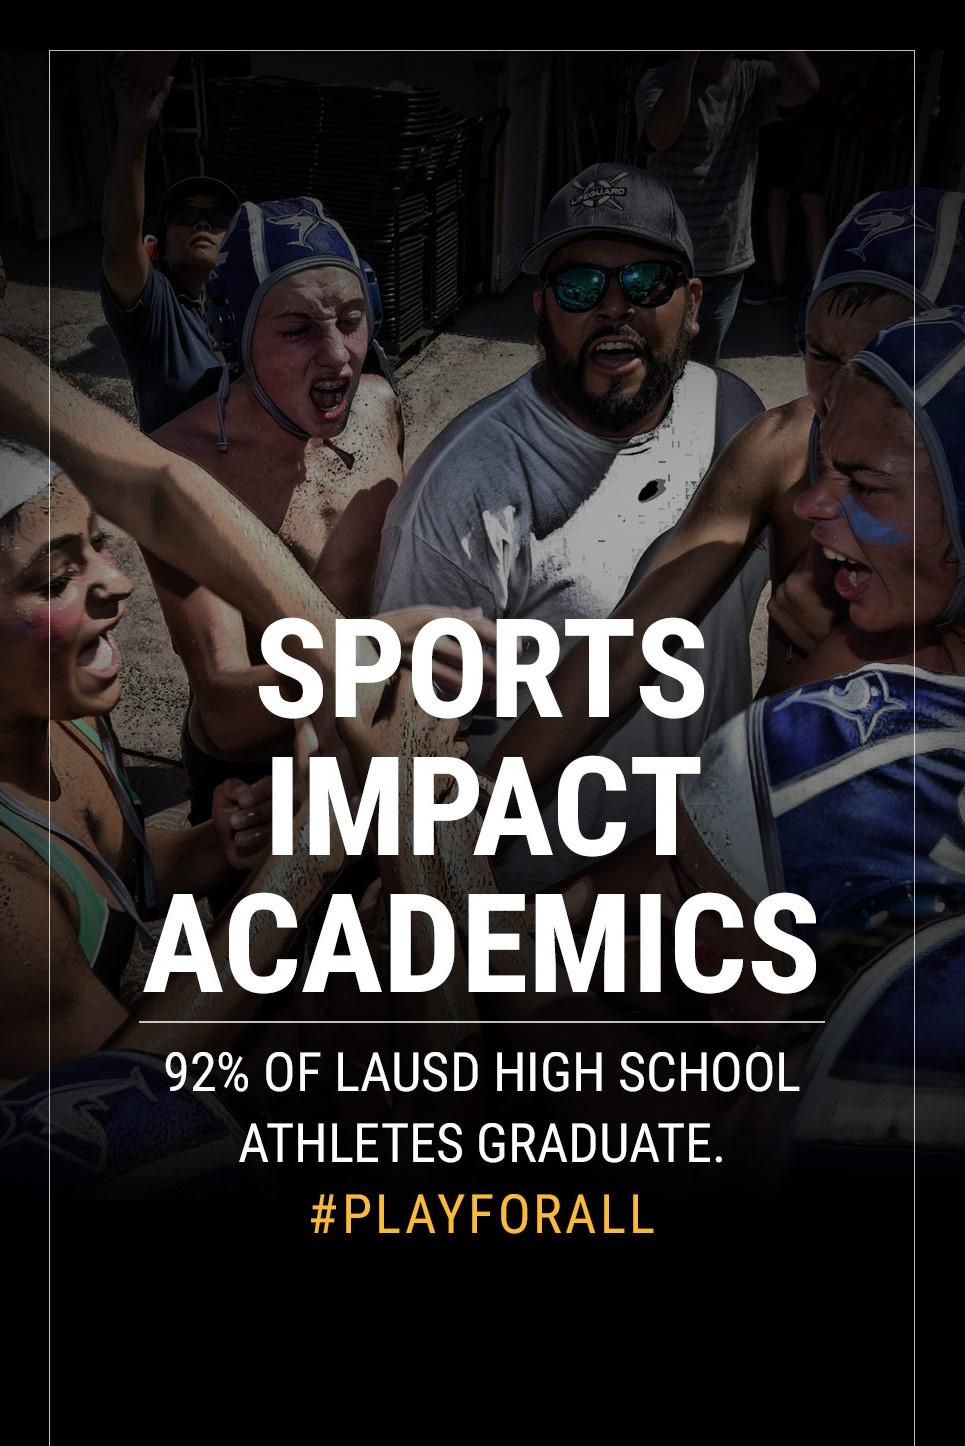 Sports Impact Academics 10-12-17 website